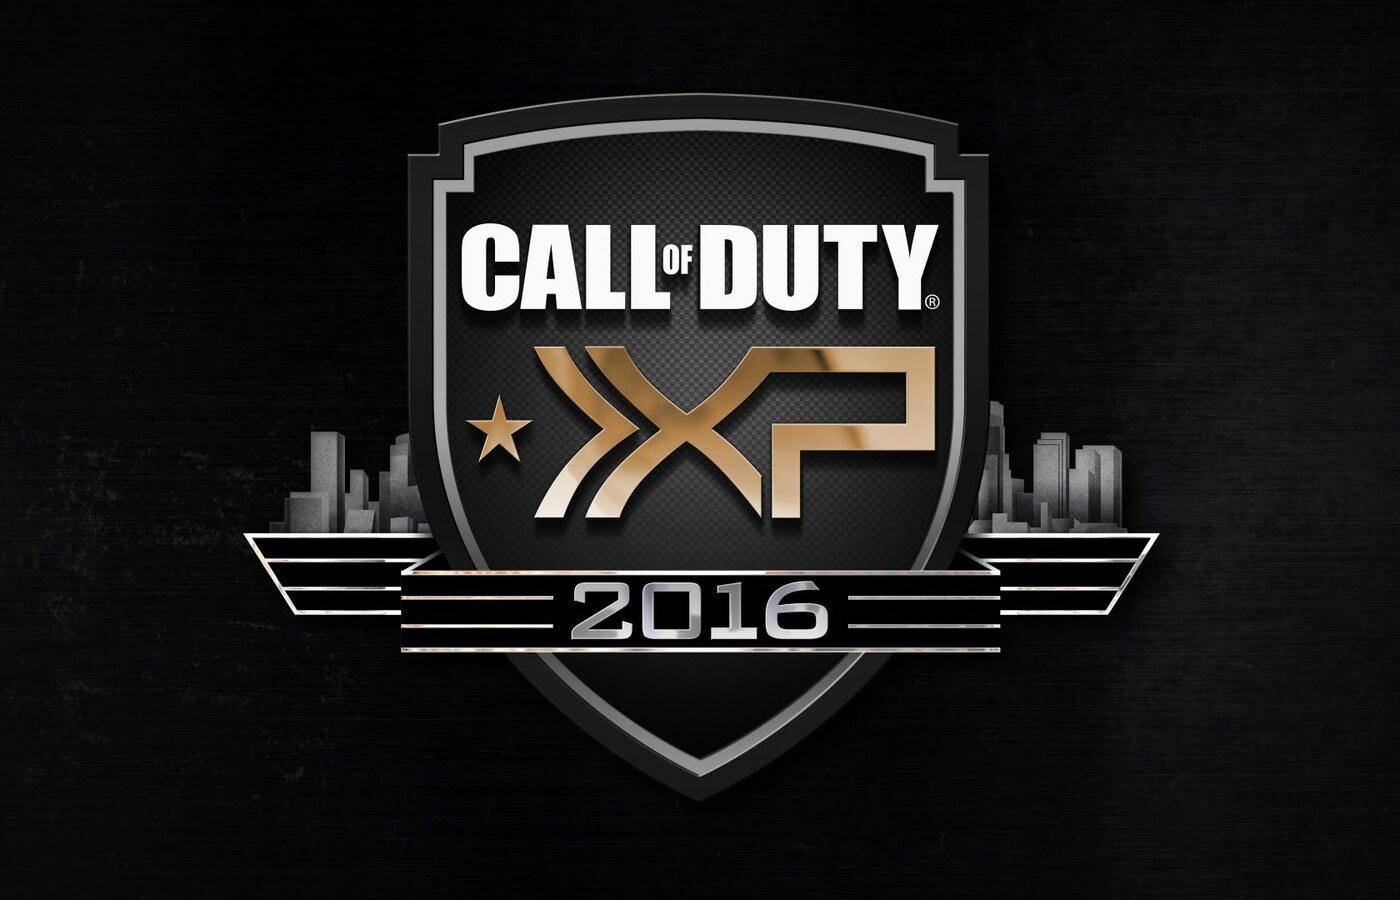 call-of-duty-xp-2016-hd.jpg